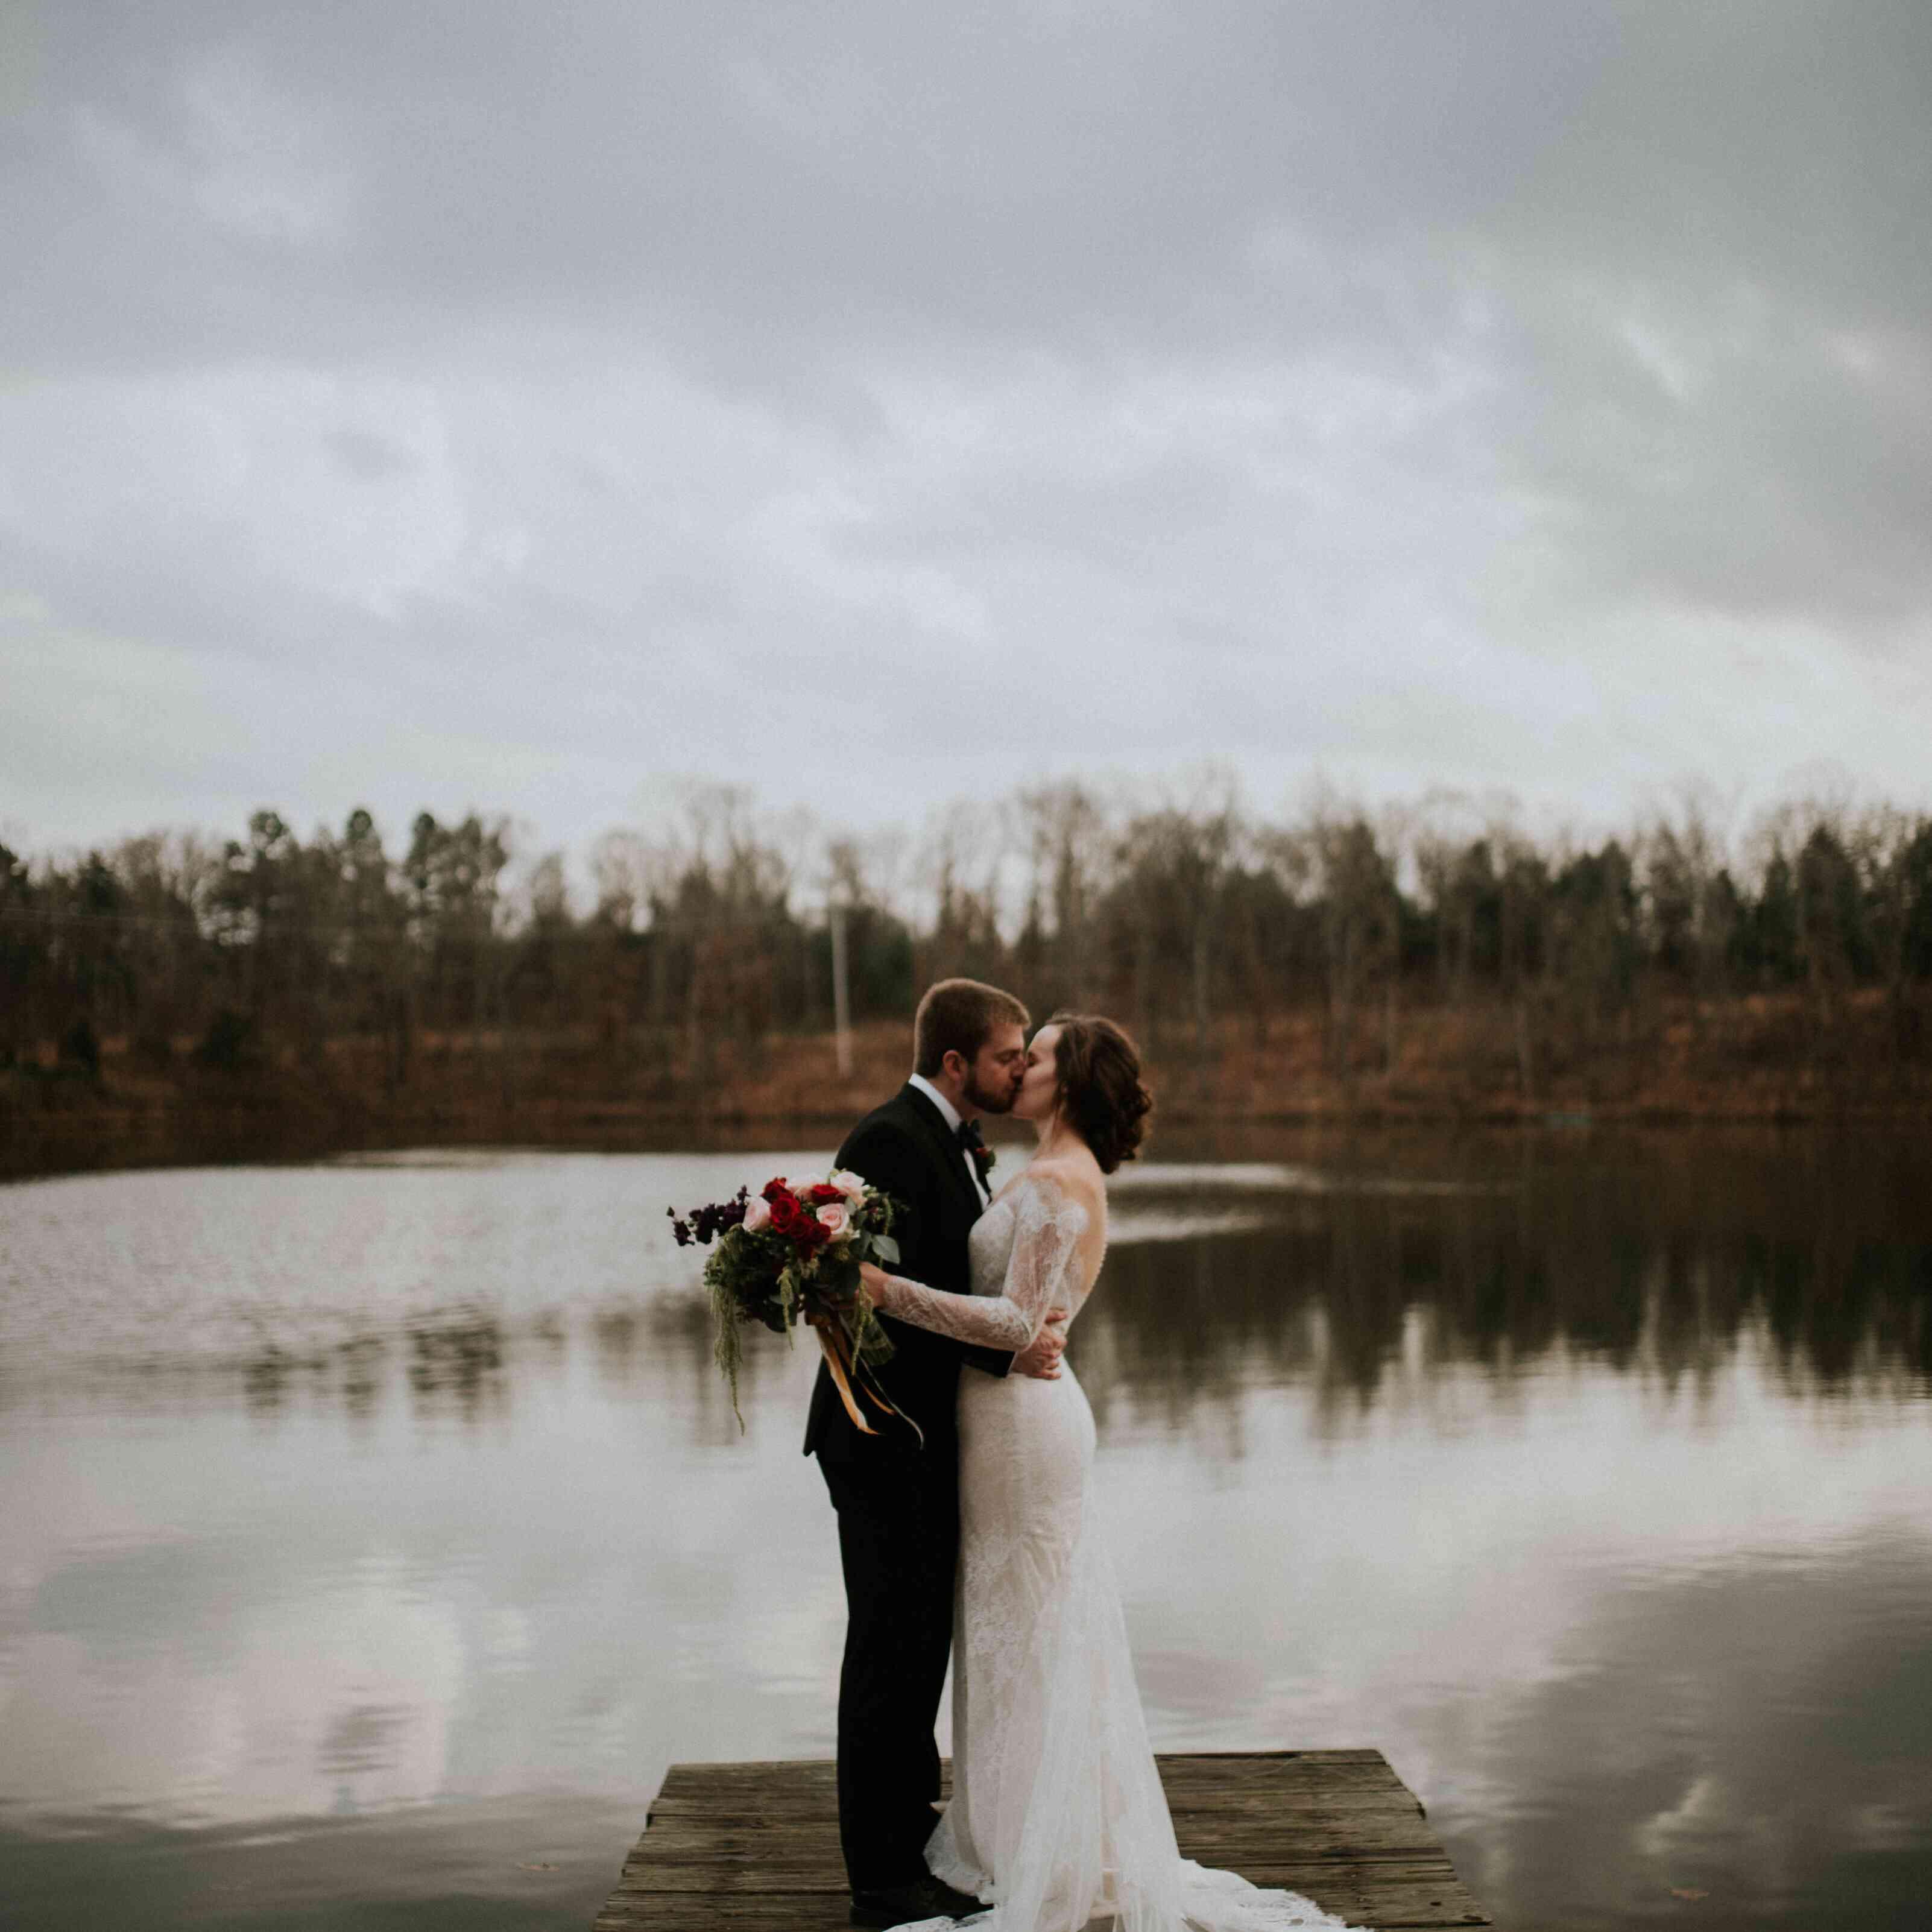 <p>Wedding photo at Camp Wyldewood in Arkansas</p>